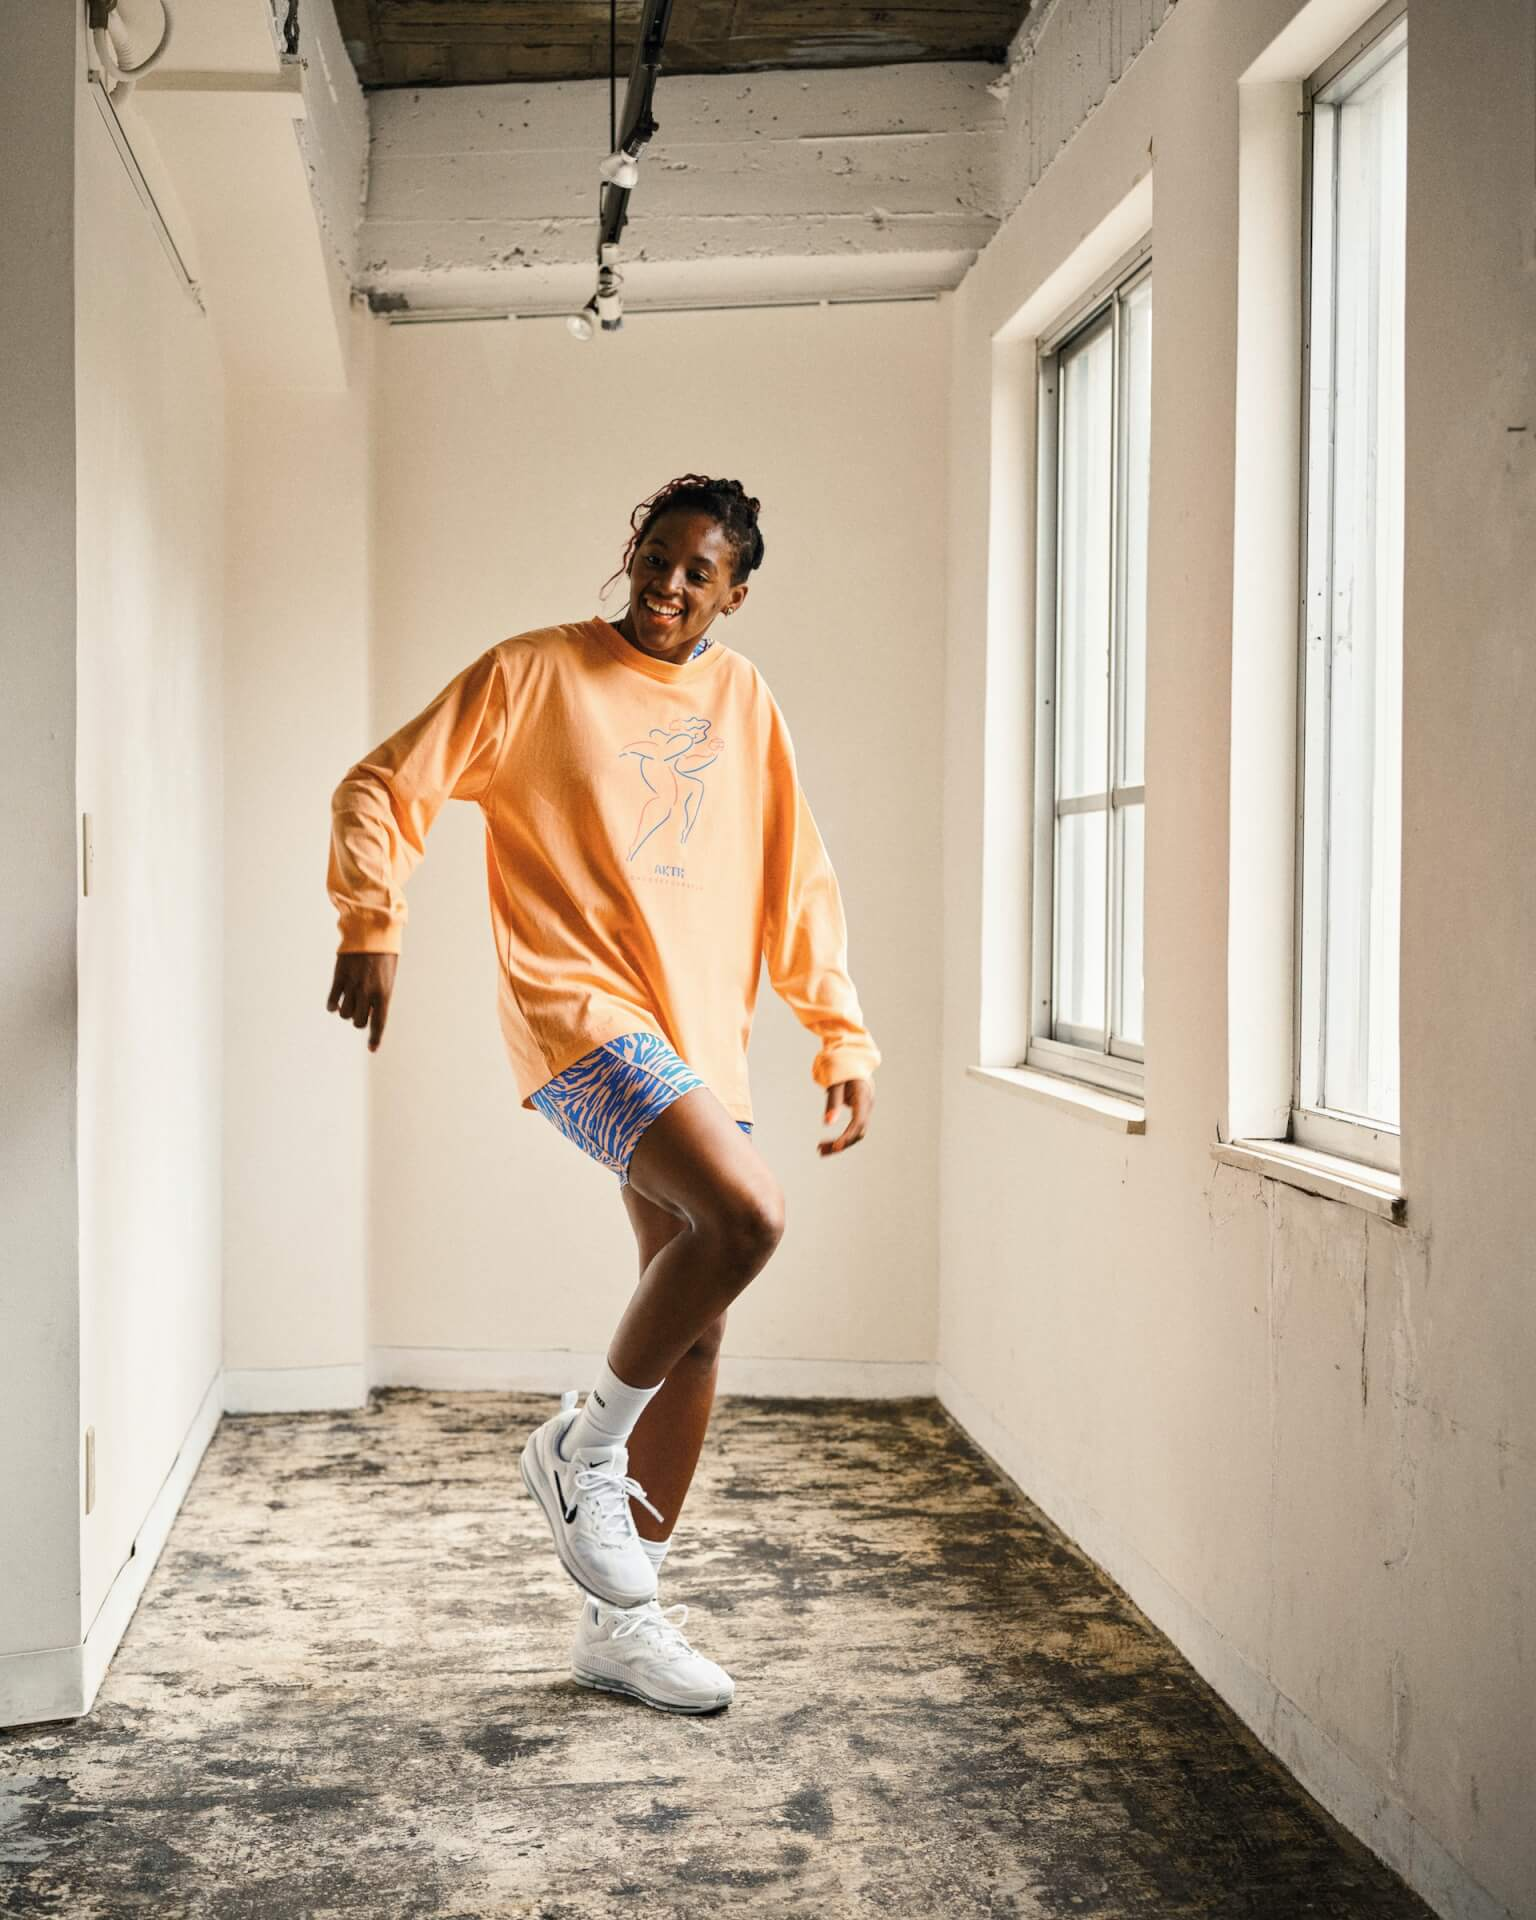 AKTRがオリジナルウィメンズライン「BREEZE collection」を発売決定!ルックに女子プロバスケットボール選手の馬瓜ステファニーらが起用 life210924_aktr_breez_016